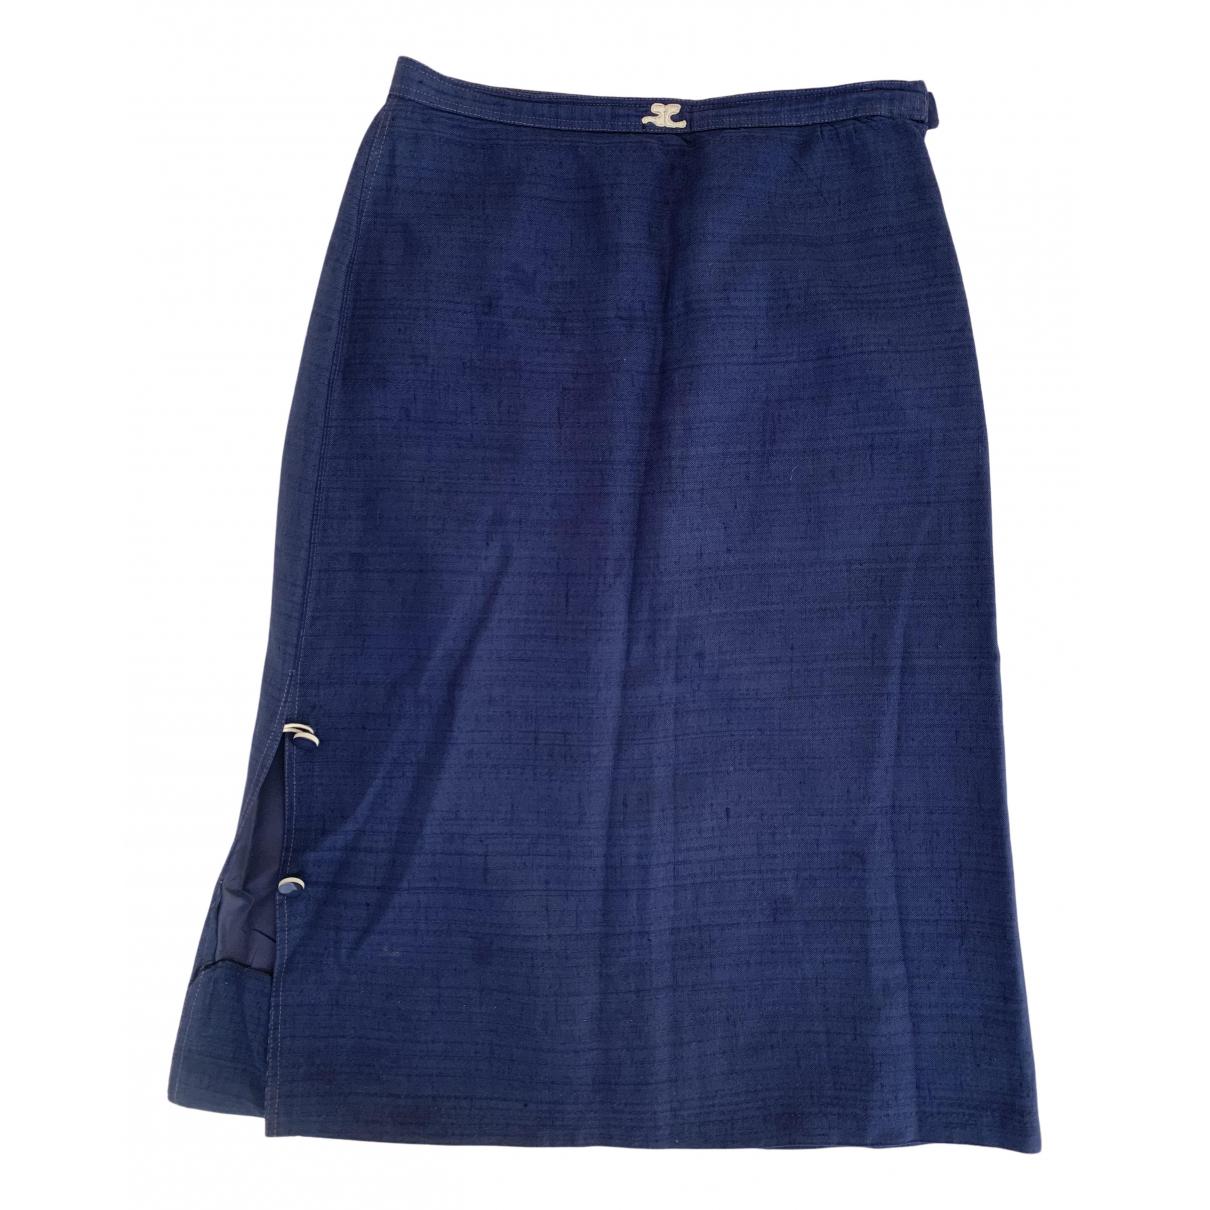 Courrèges N Blue Cotton skirt for Women 00 0-5